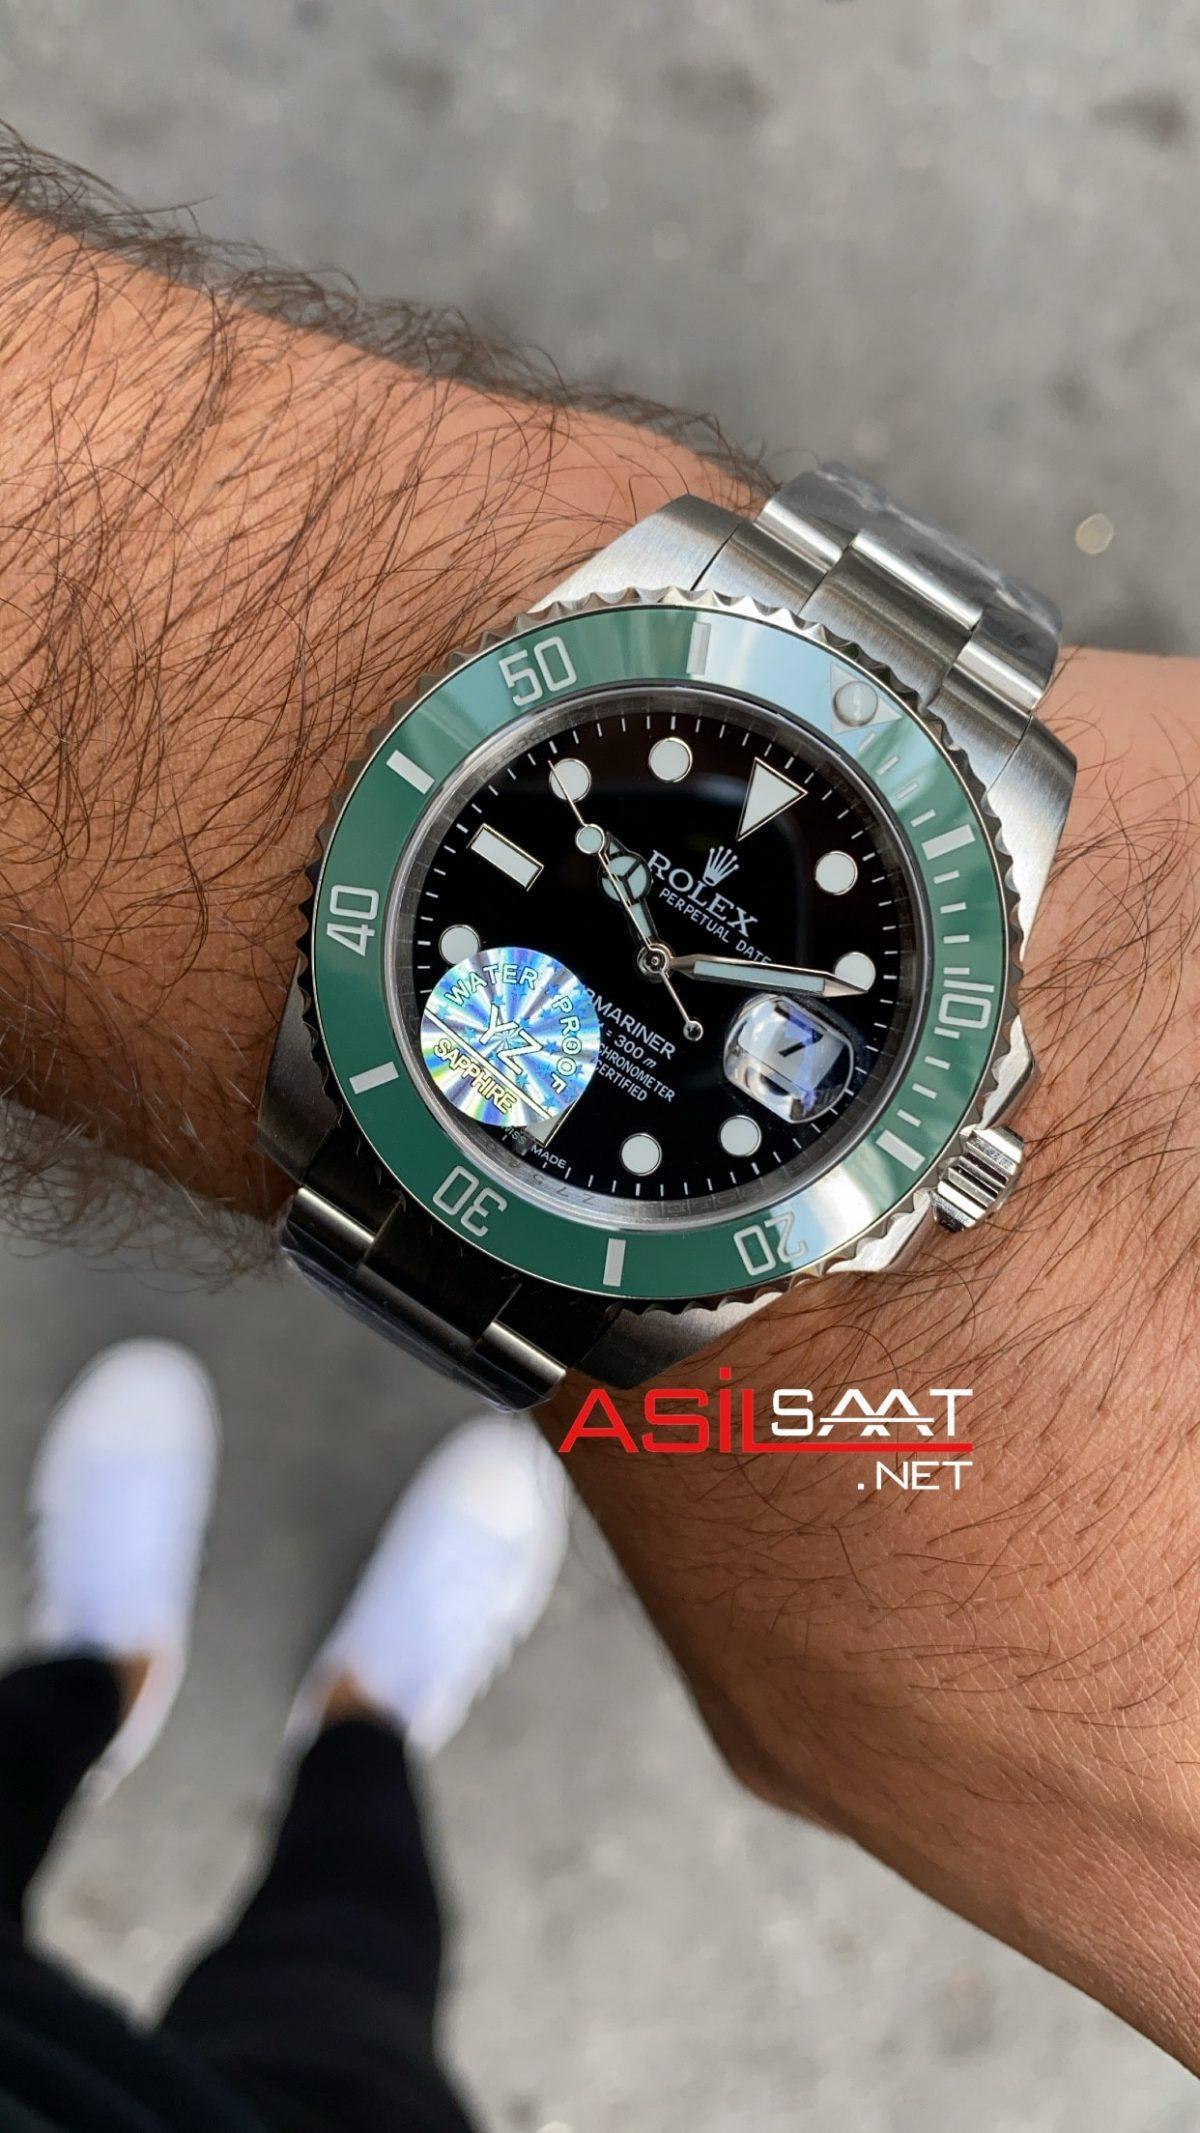 Rolex Submariner Starbucks 126610 LV ROLS004